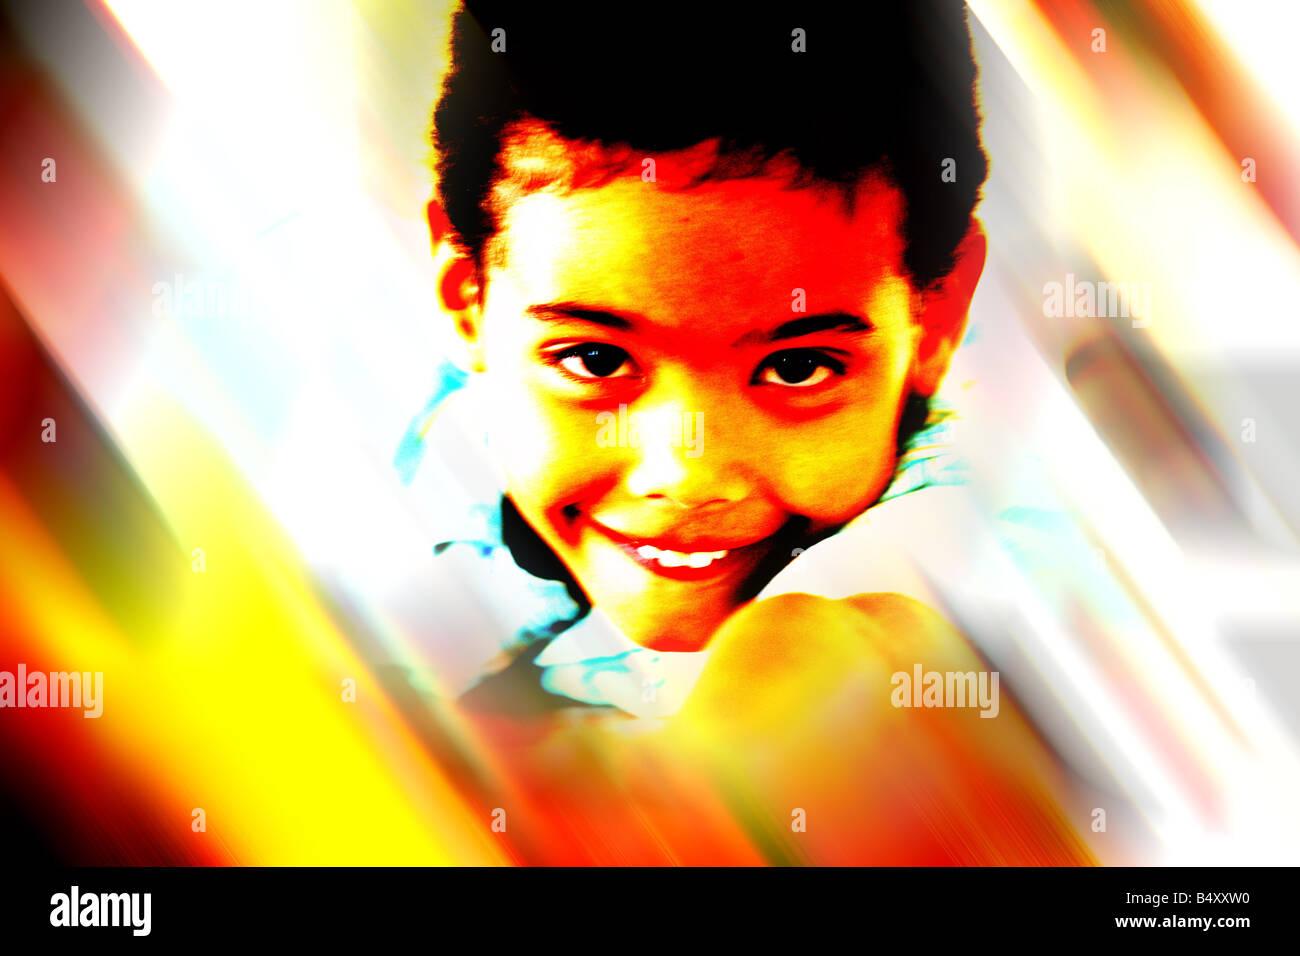 Boy smiling, portrait - Stock Image